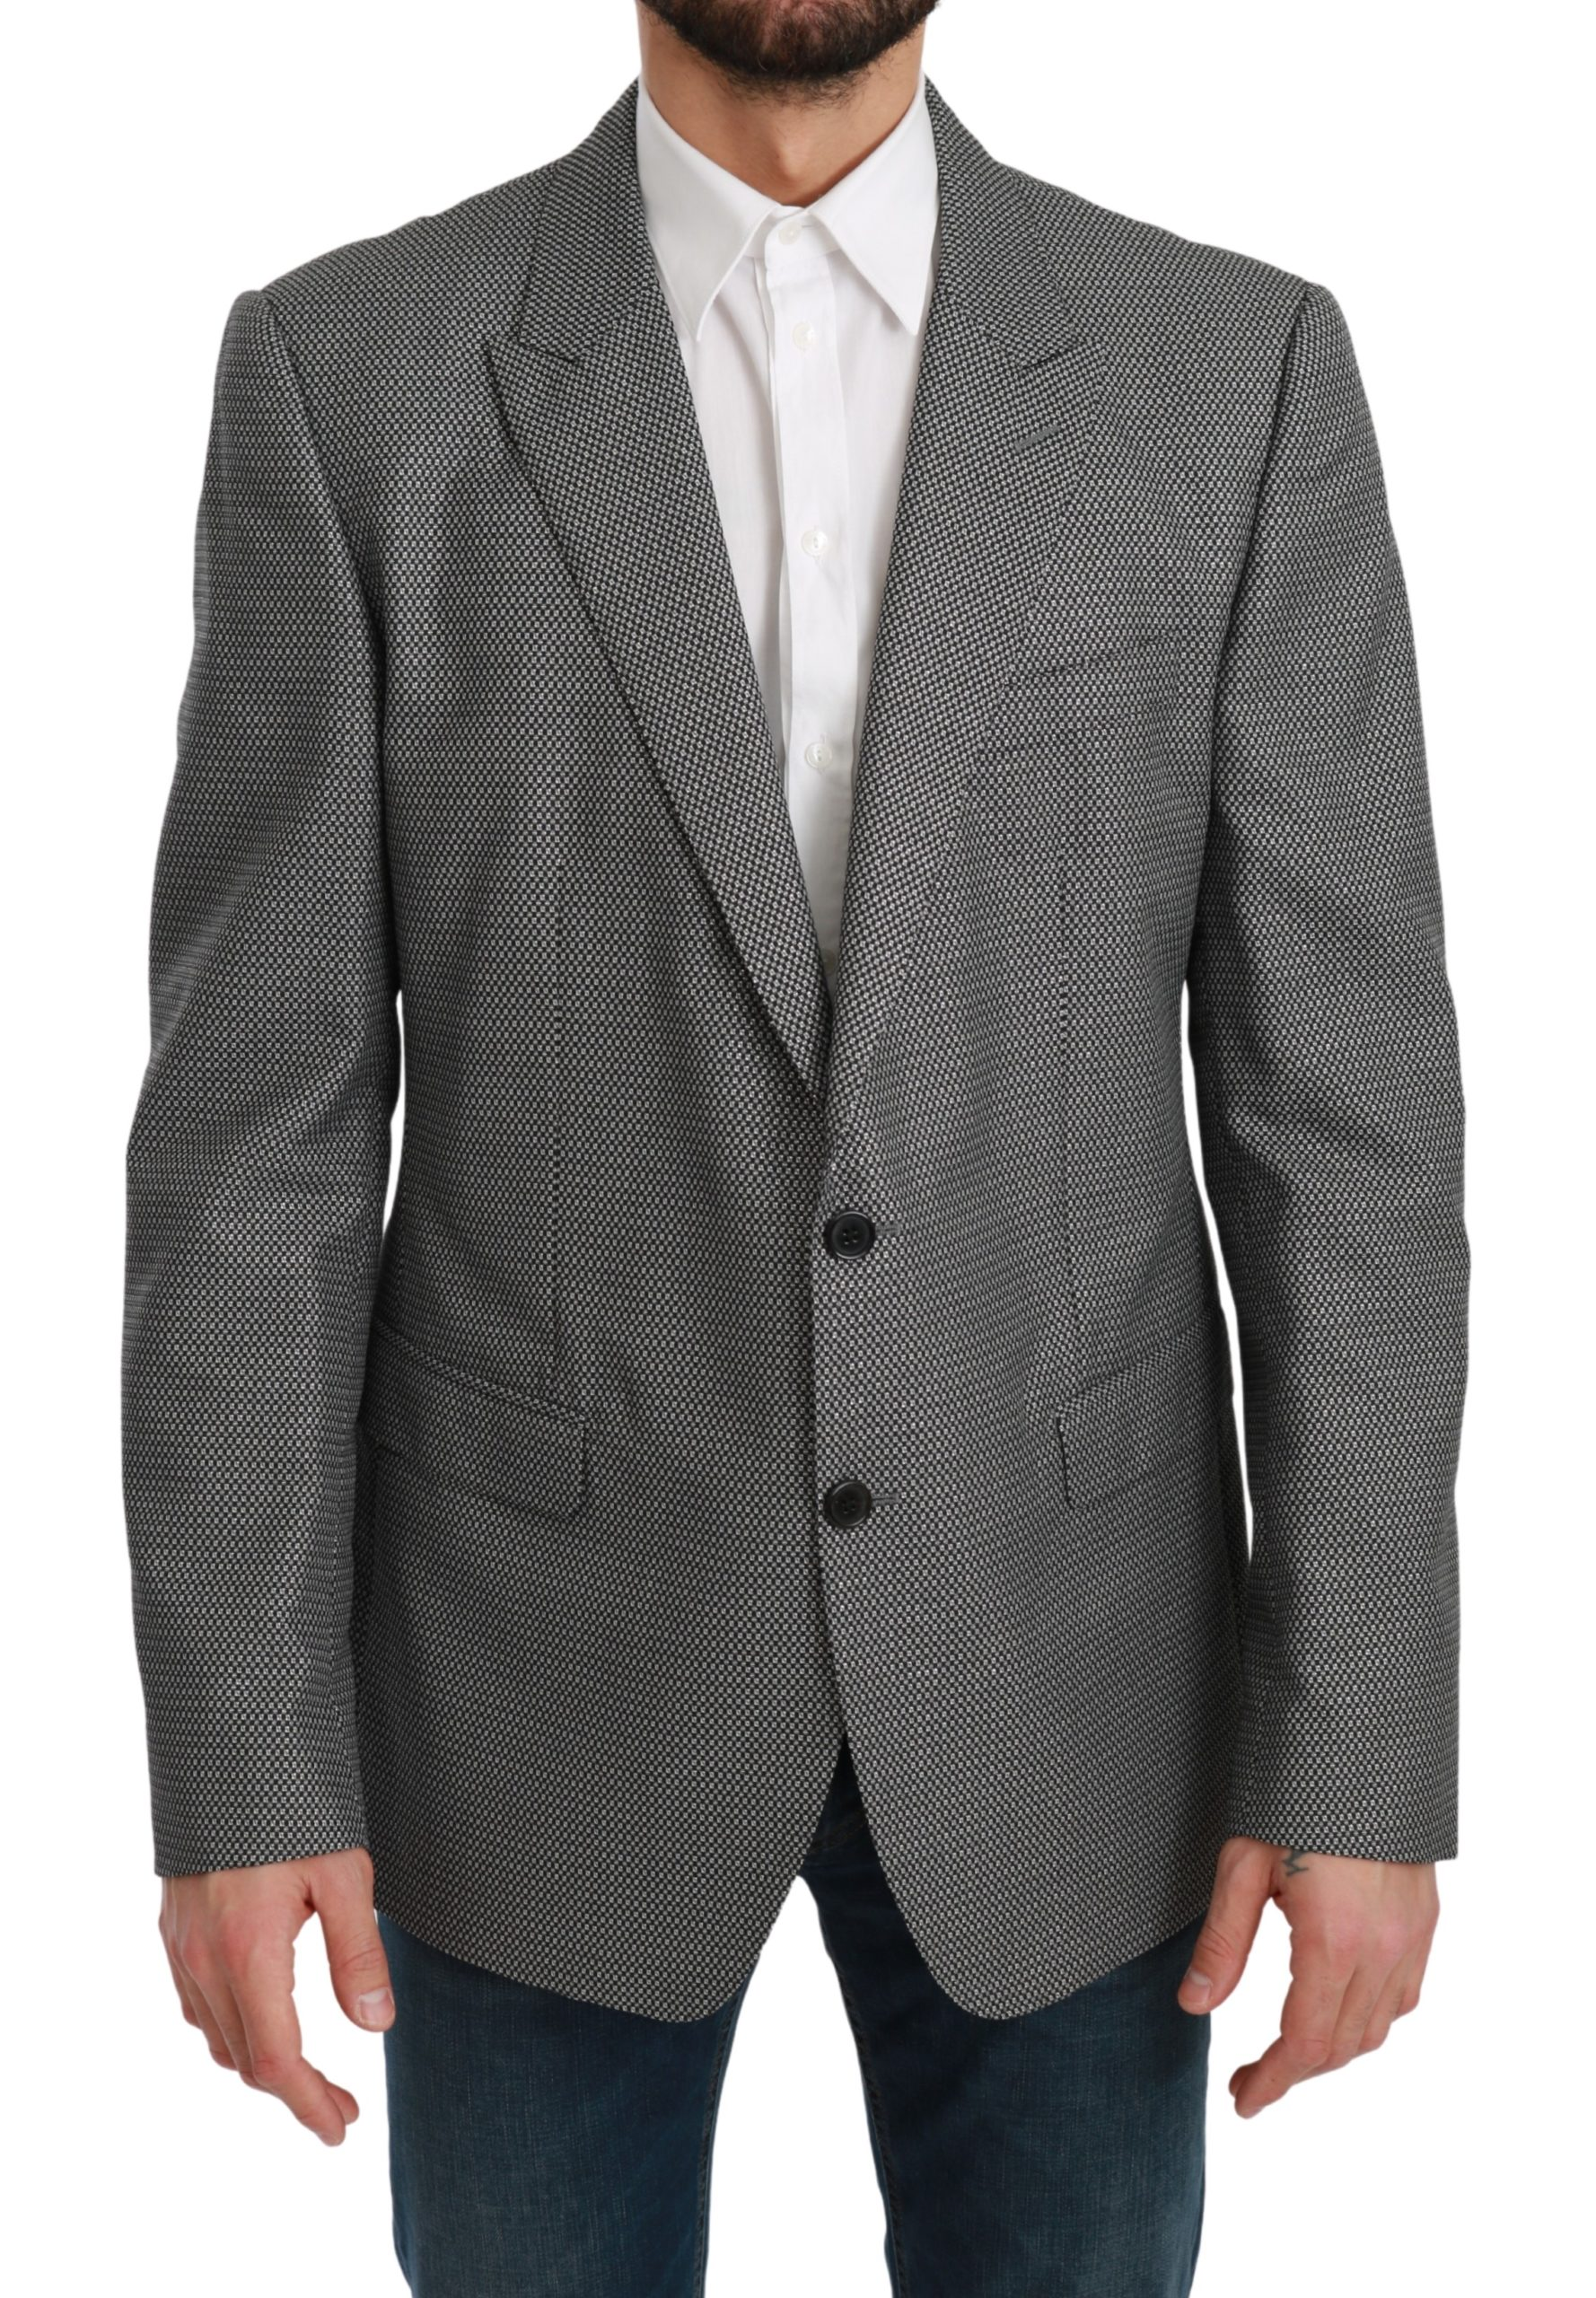 Dolce & Gabbana Men's Slim Fit Formal MARTINI Blazer Gray KOS1713 - IT54 | XL